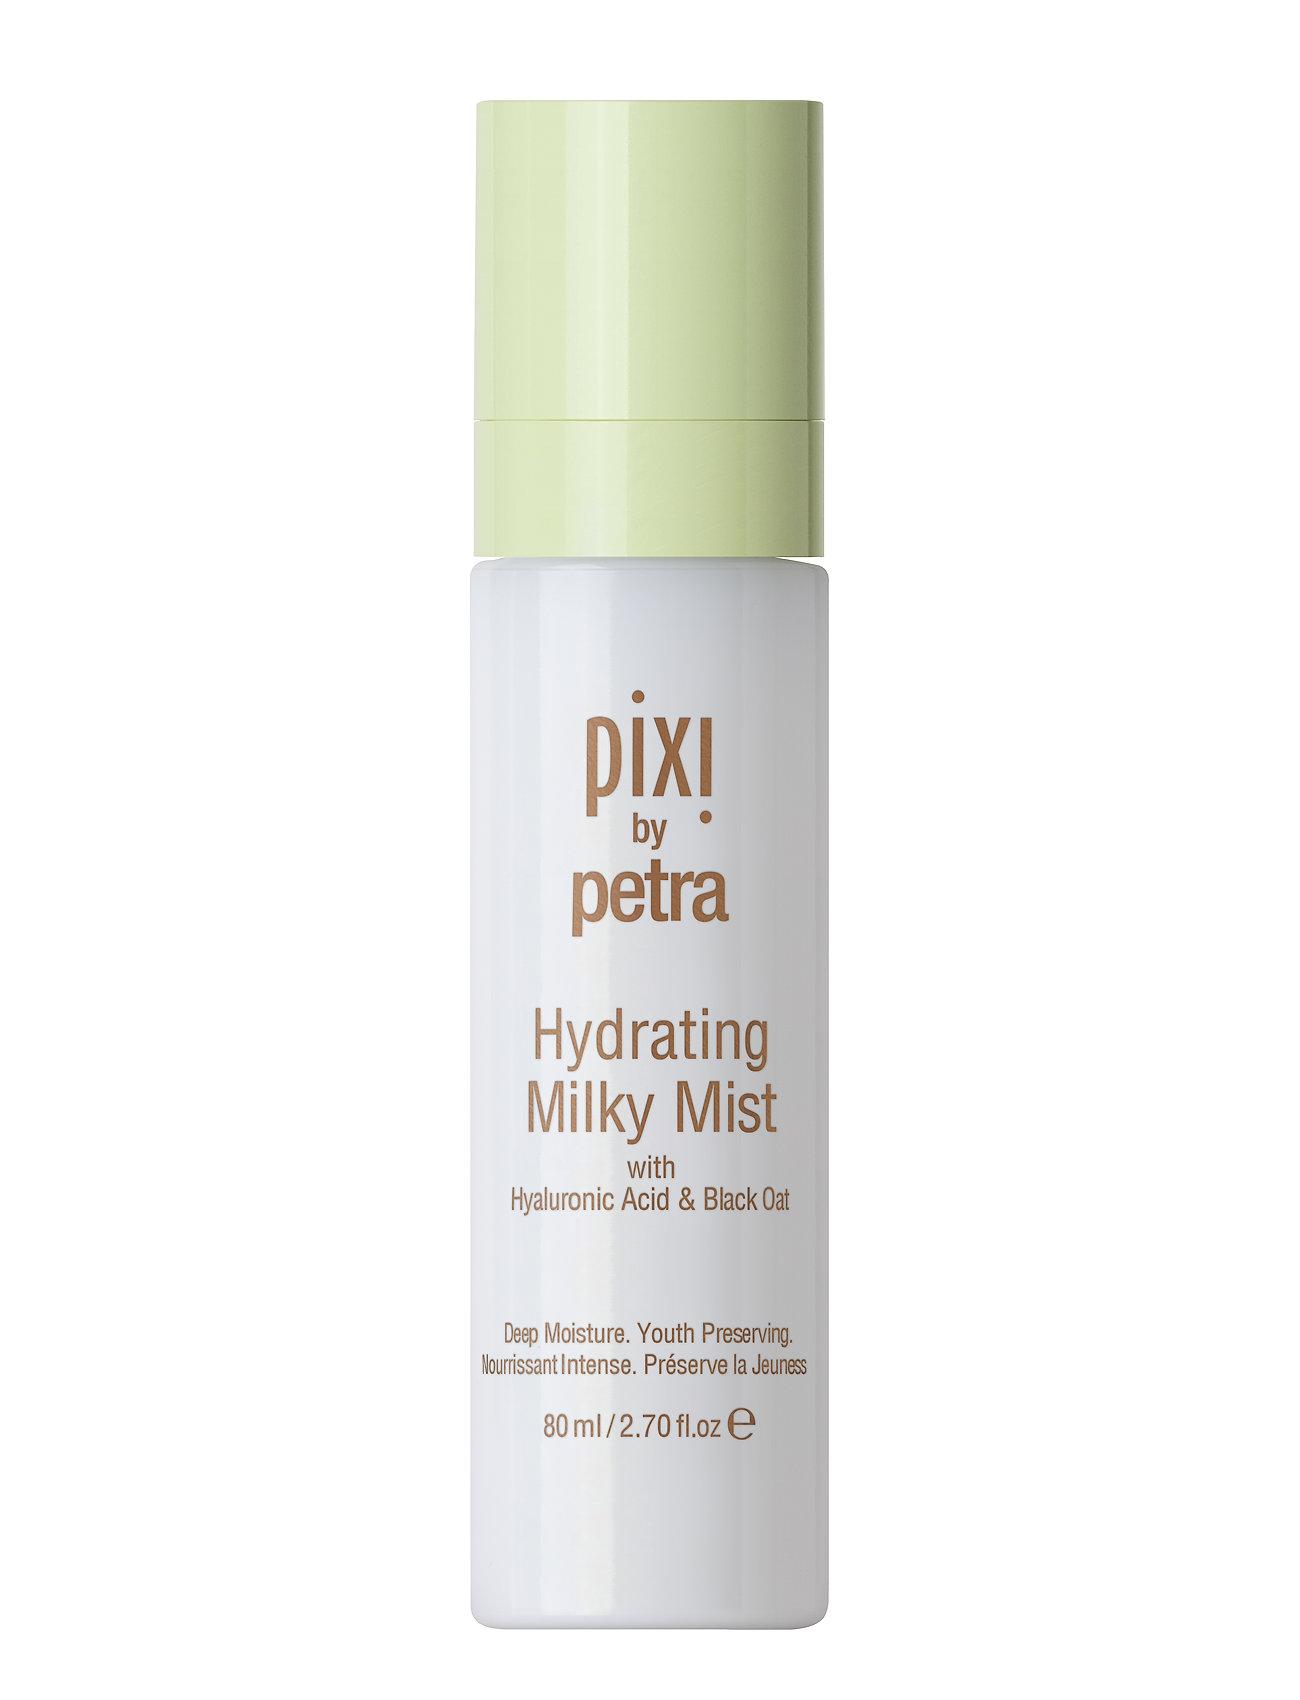 Image of Hydrating Milky Mist Beauty WOMEN Skin Care Face Face Mist Nude Pixi (3215788257)